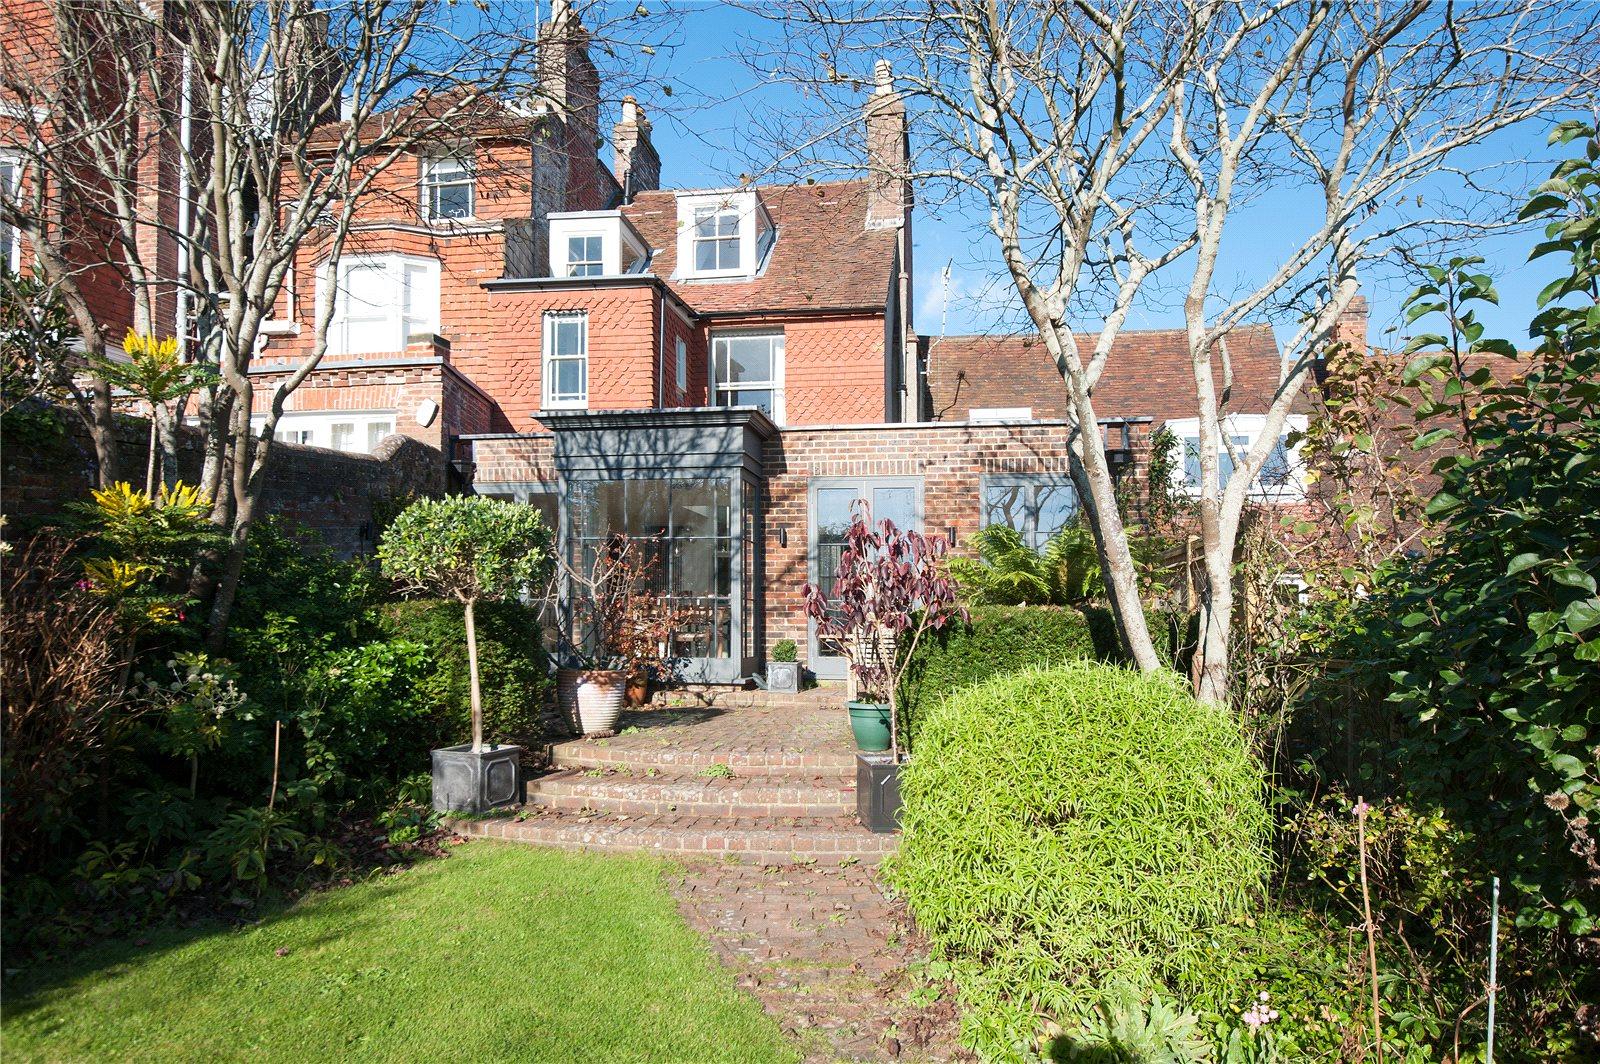 Moradia para Venda às High Street, Lewes, East Sussex, BN7 Lewes, Inglaterra